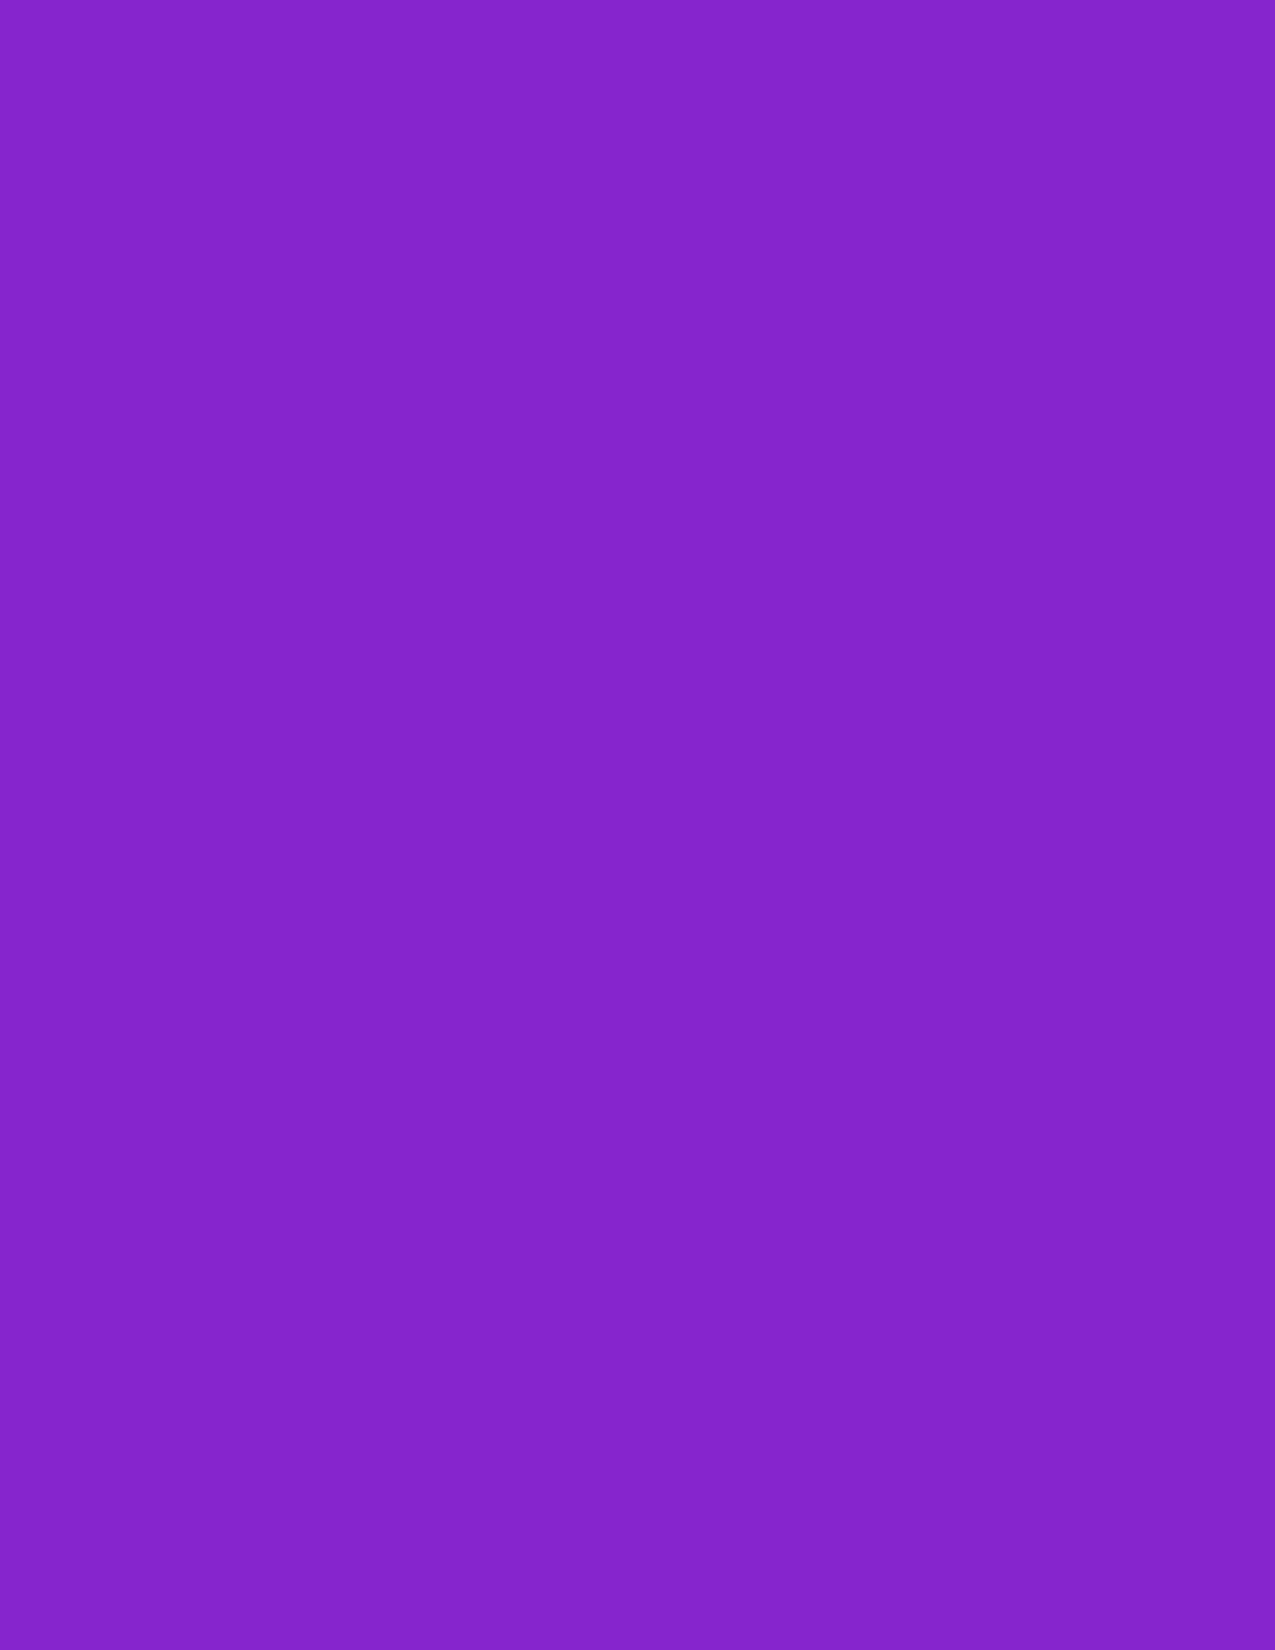 Solids 1343 00000 0236 (3.47 yd)